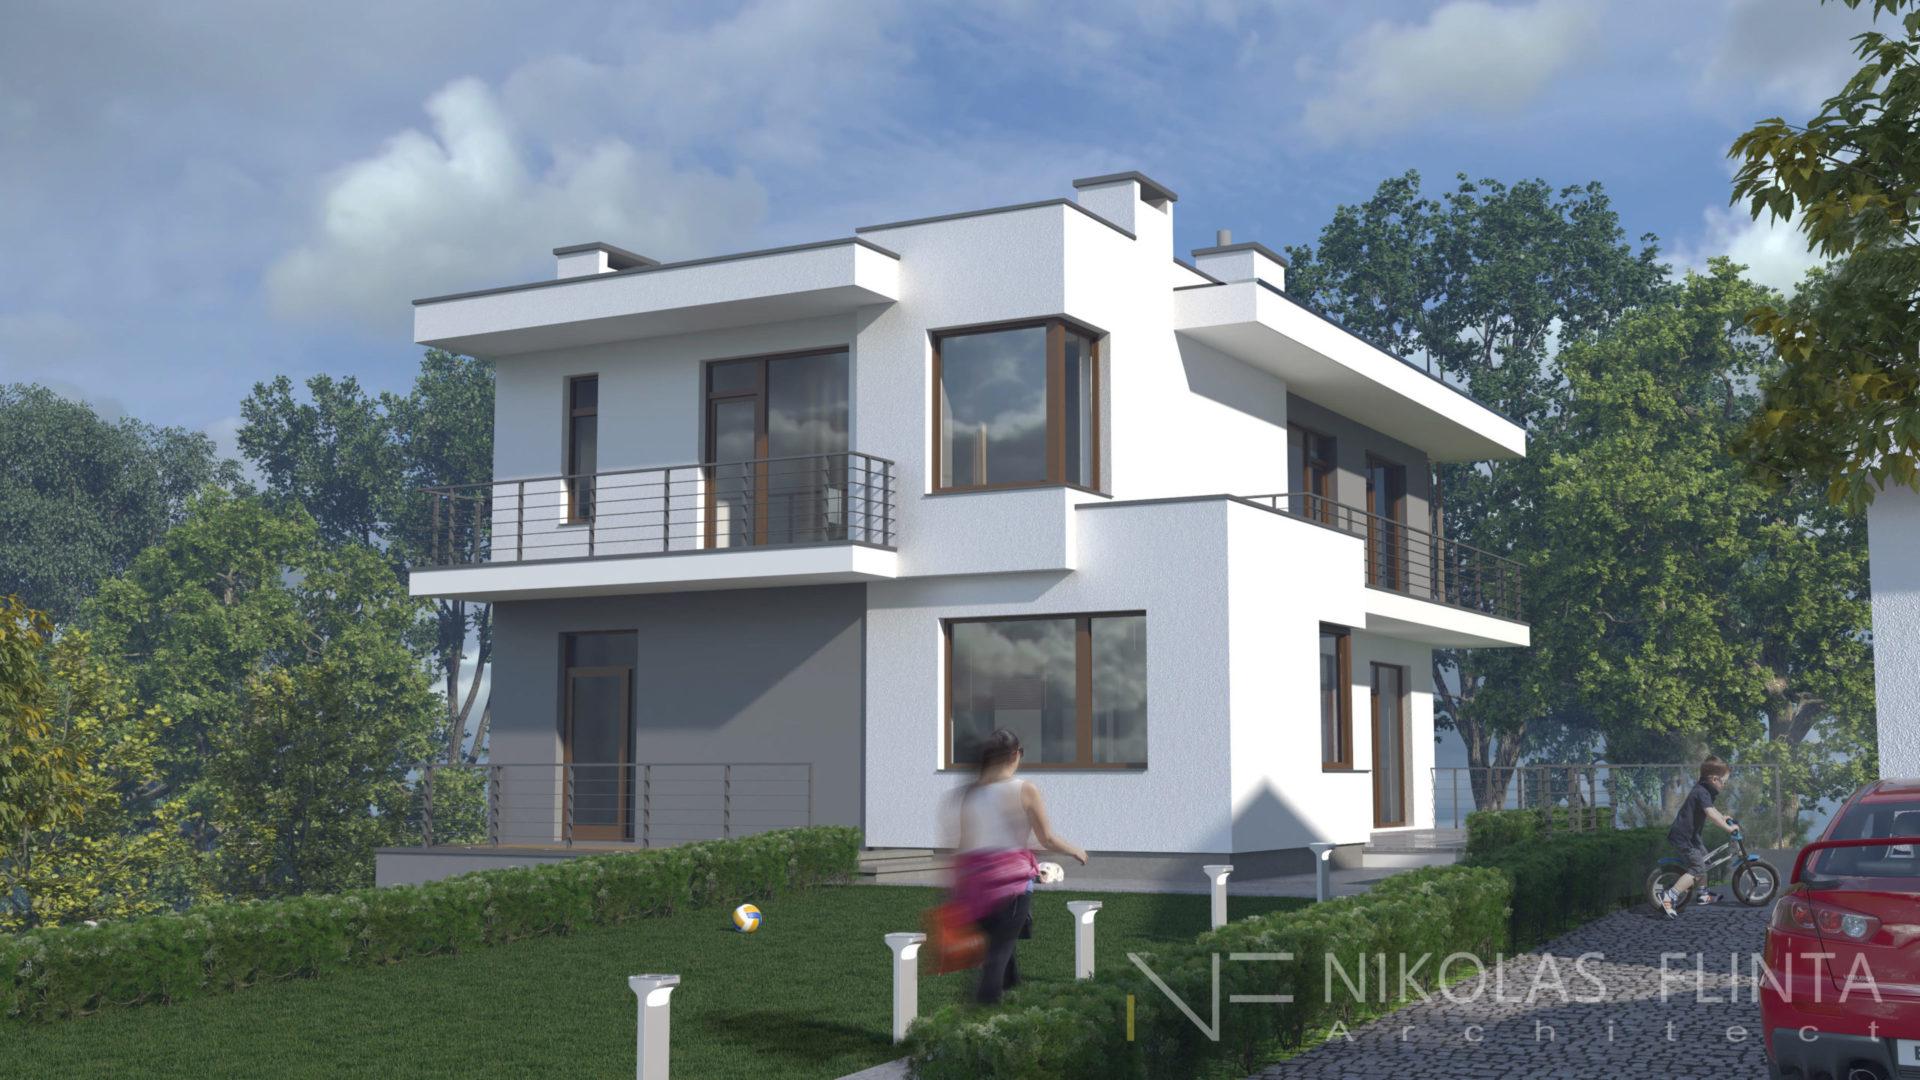 House-01KT_01-1-scaled.jpg